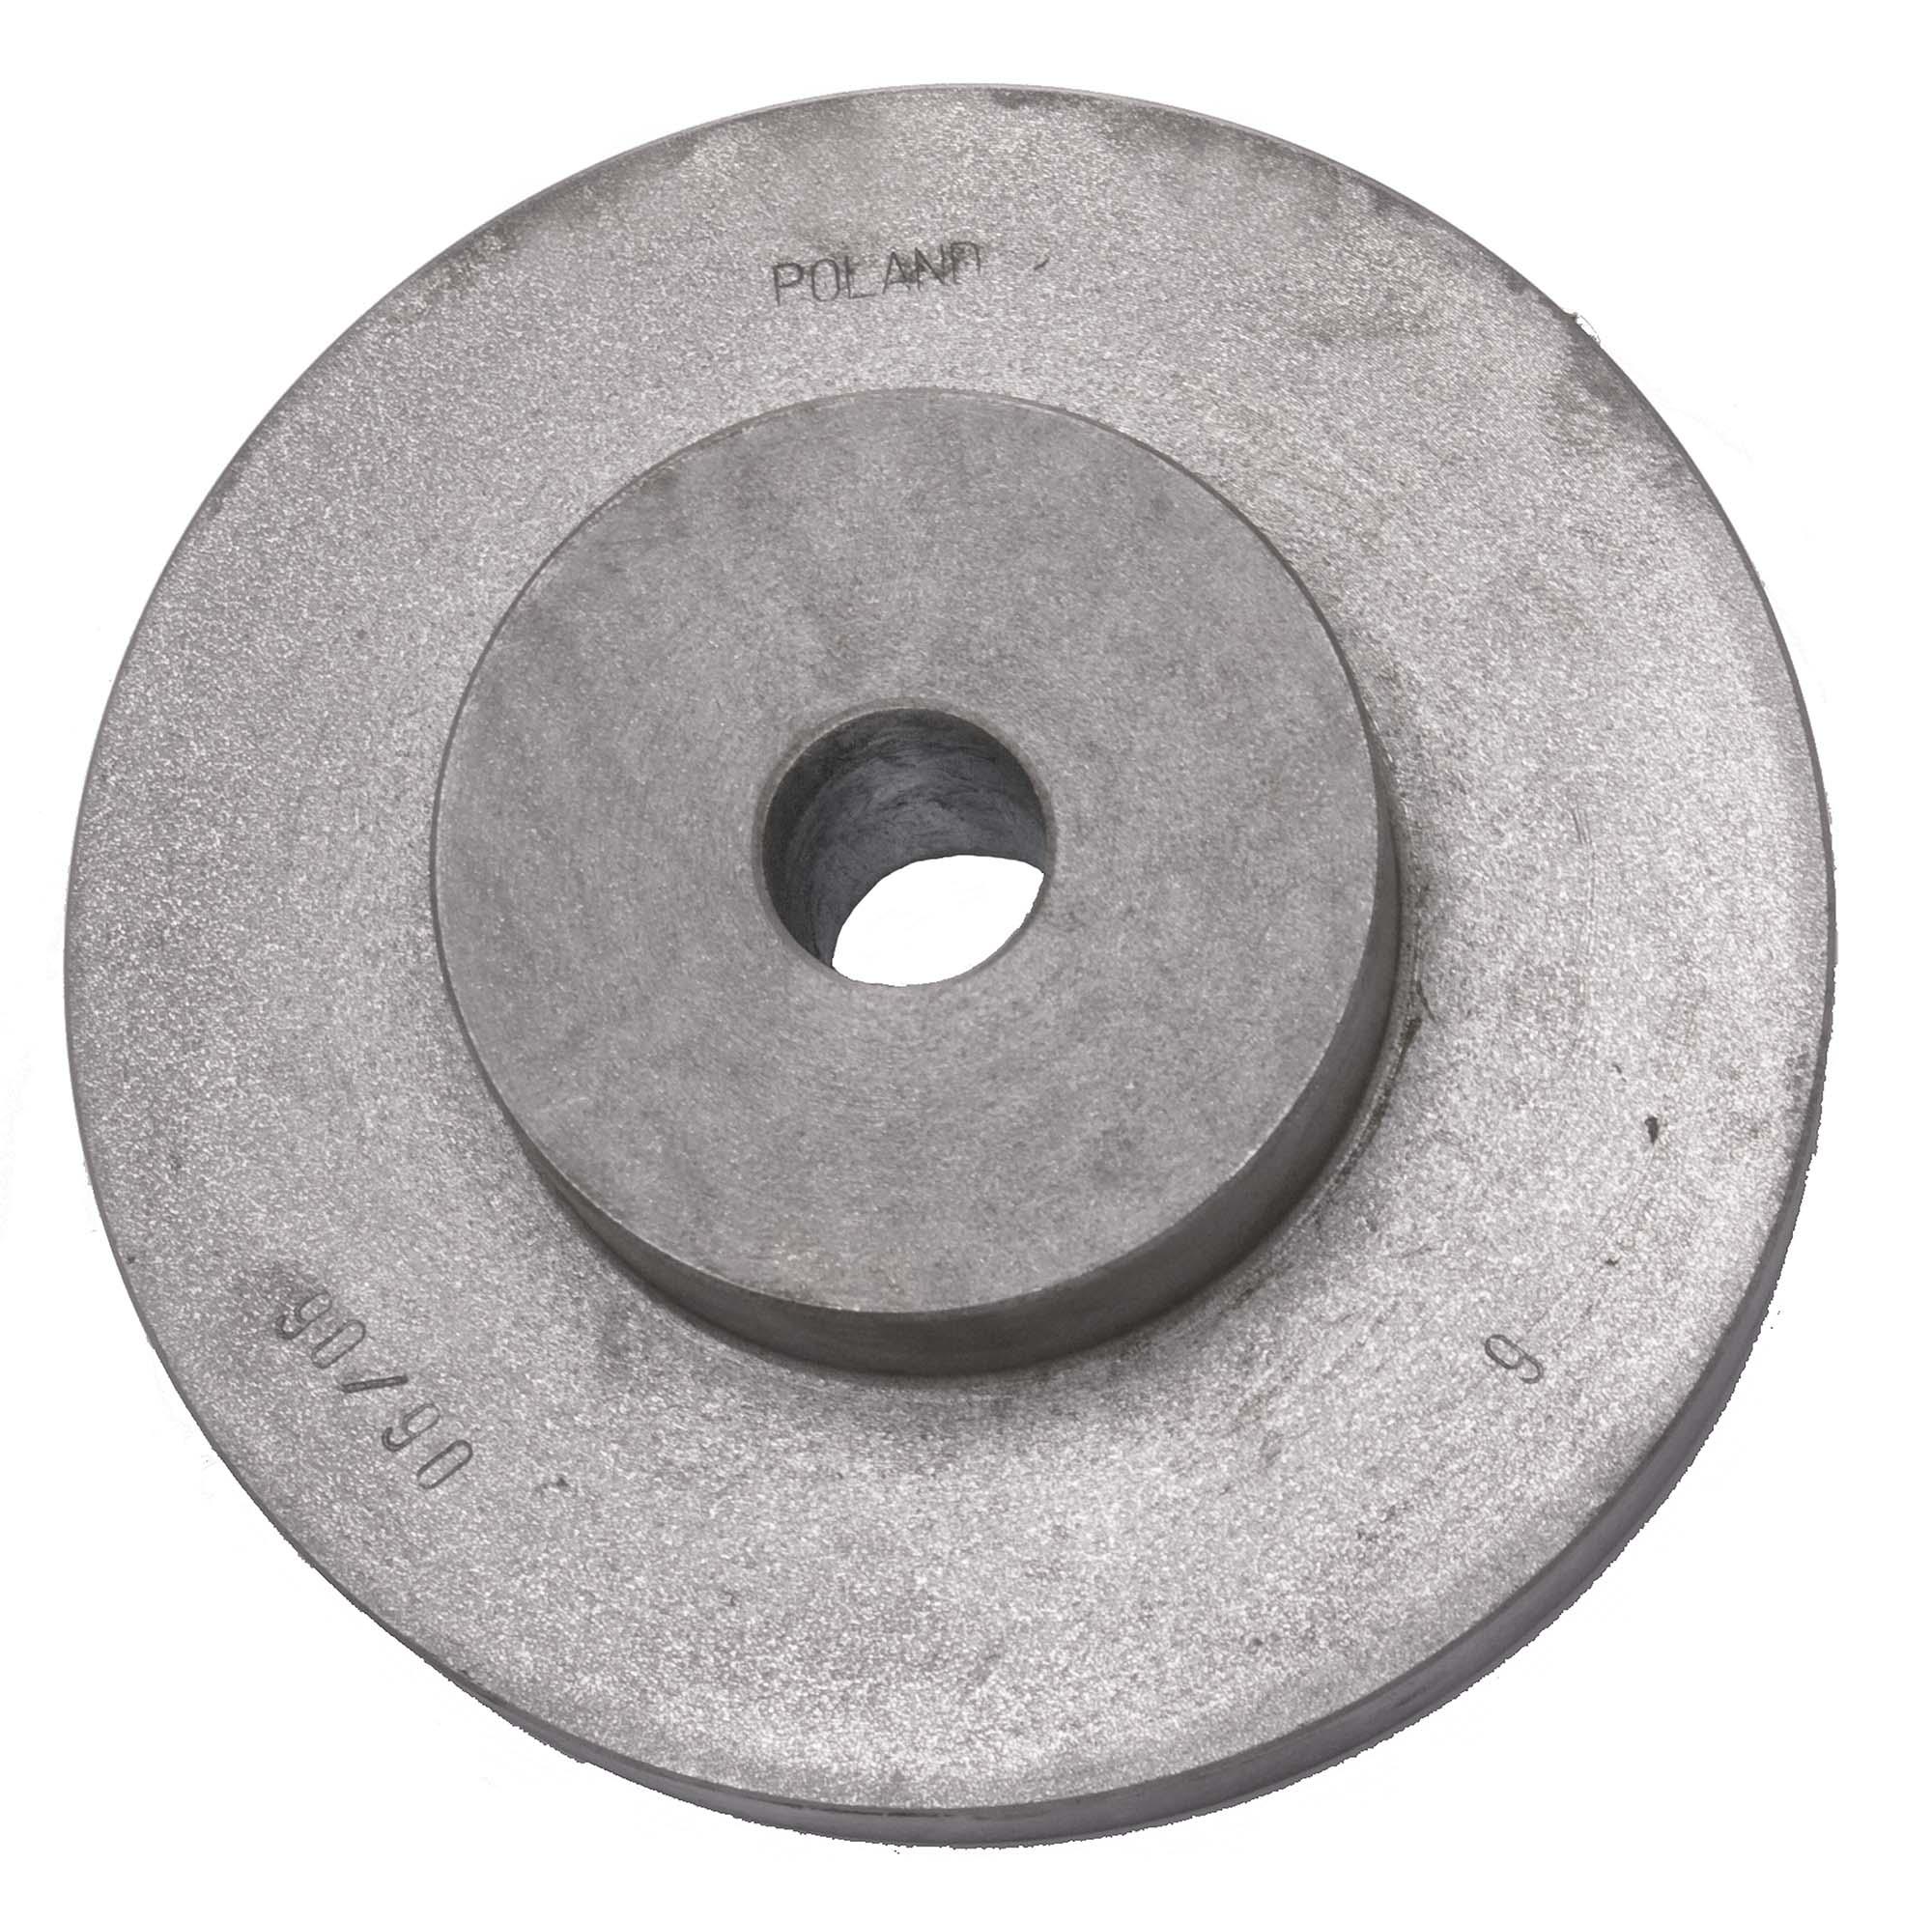 "Bison 7-870-108 8-1/4"" Unfinished Back Plate for Lathe Chucks"